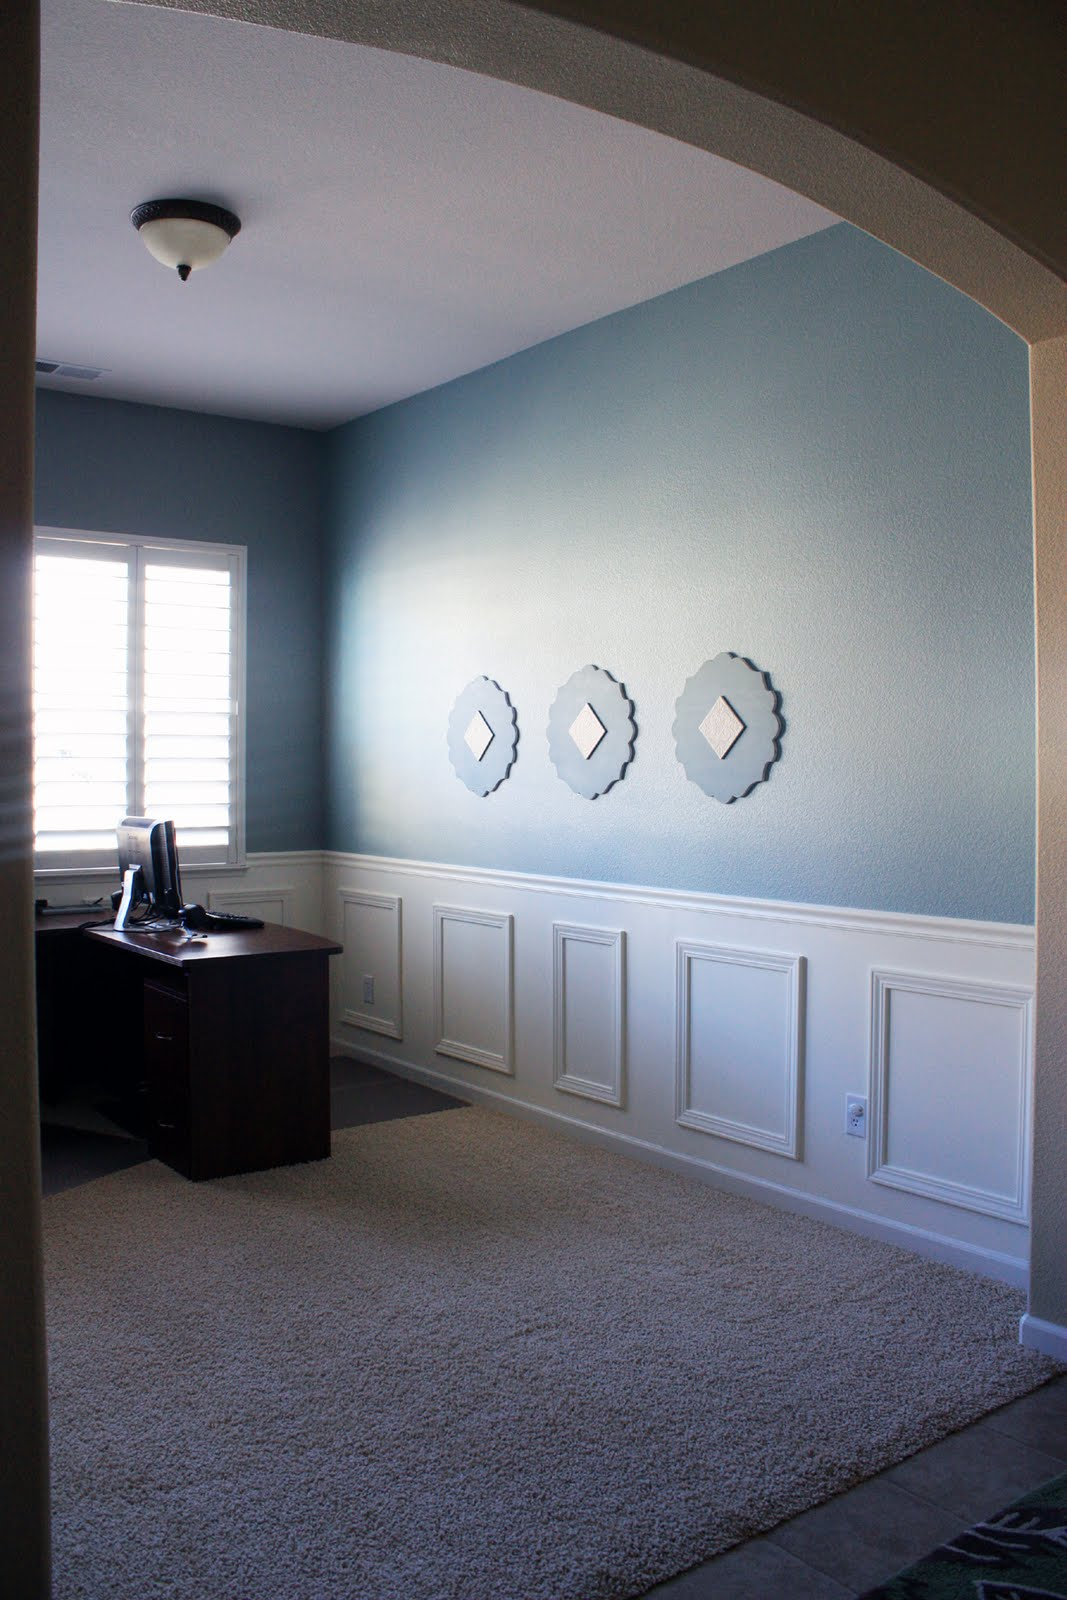 Diy Wall Paneling : The sassy pepper diy wall paneling wainscoting